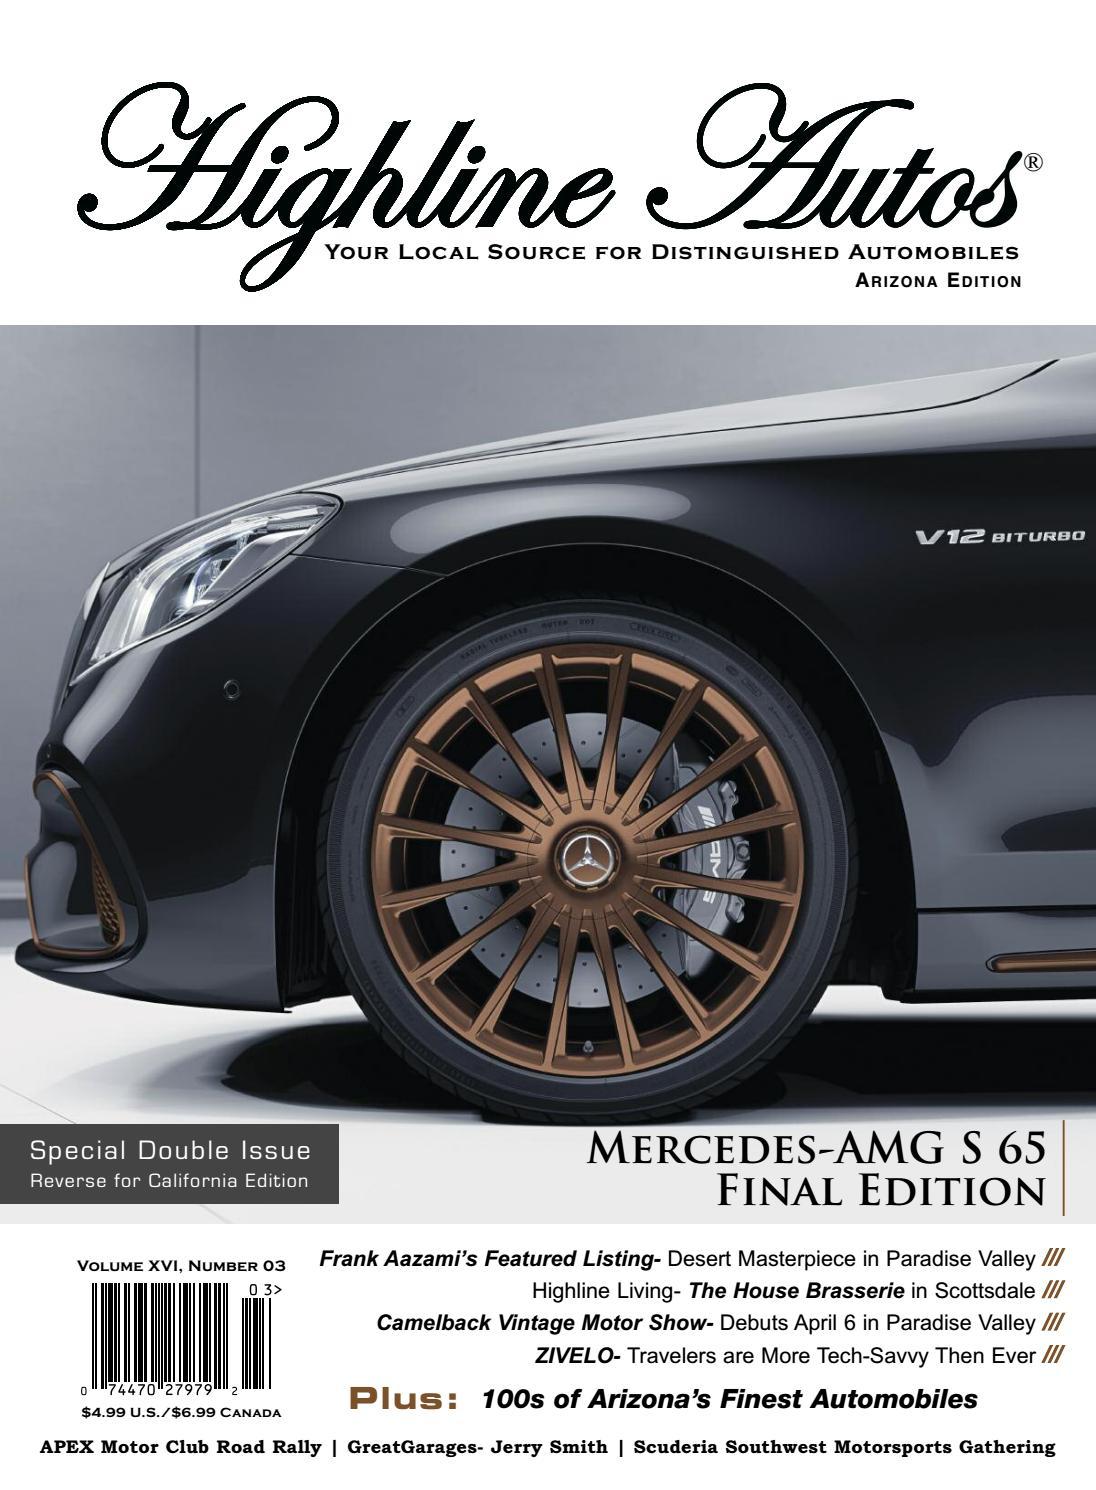 OEM Replacement 4 luxury Auto License Plate Screws Bolts hex zinc for Lexus car